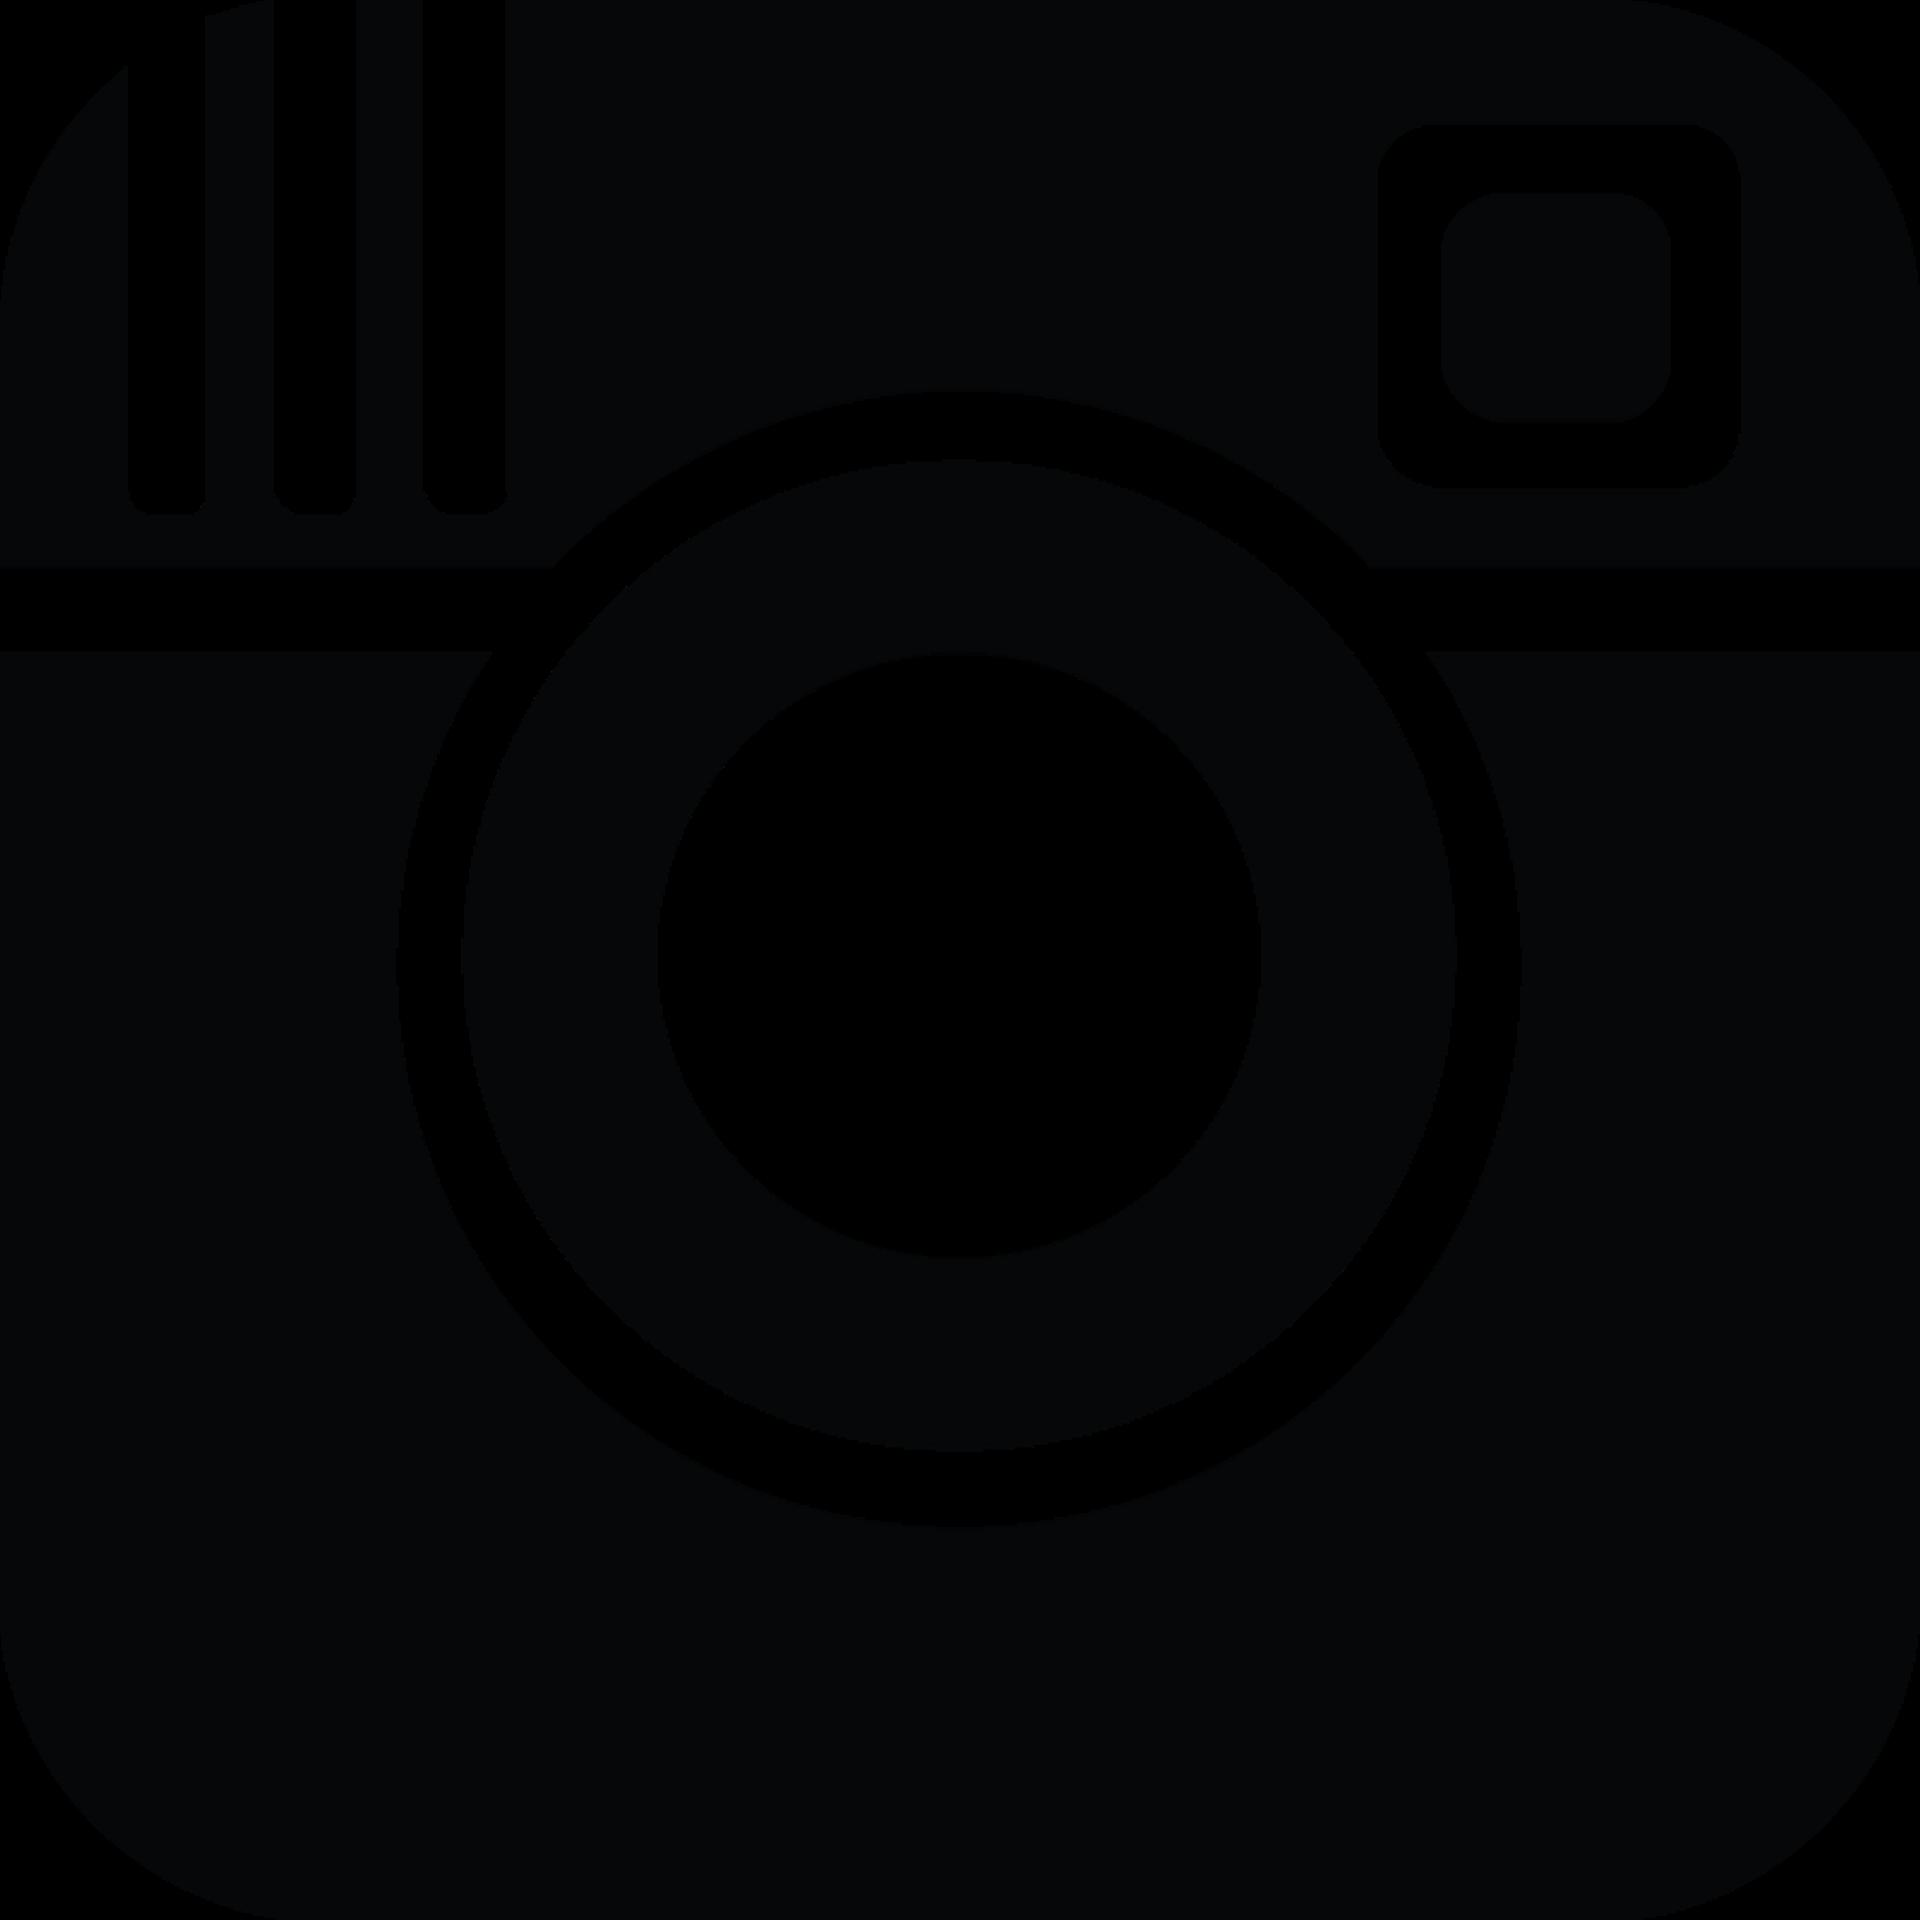 Instagram clipart full hd, Instagram full hd Transparent.